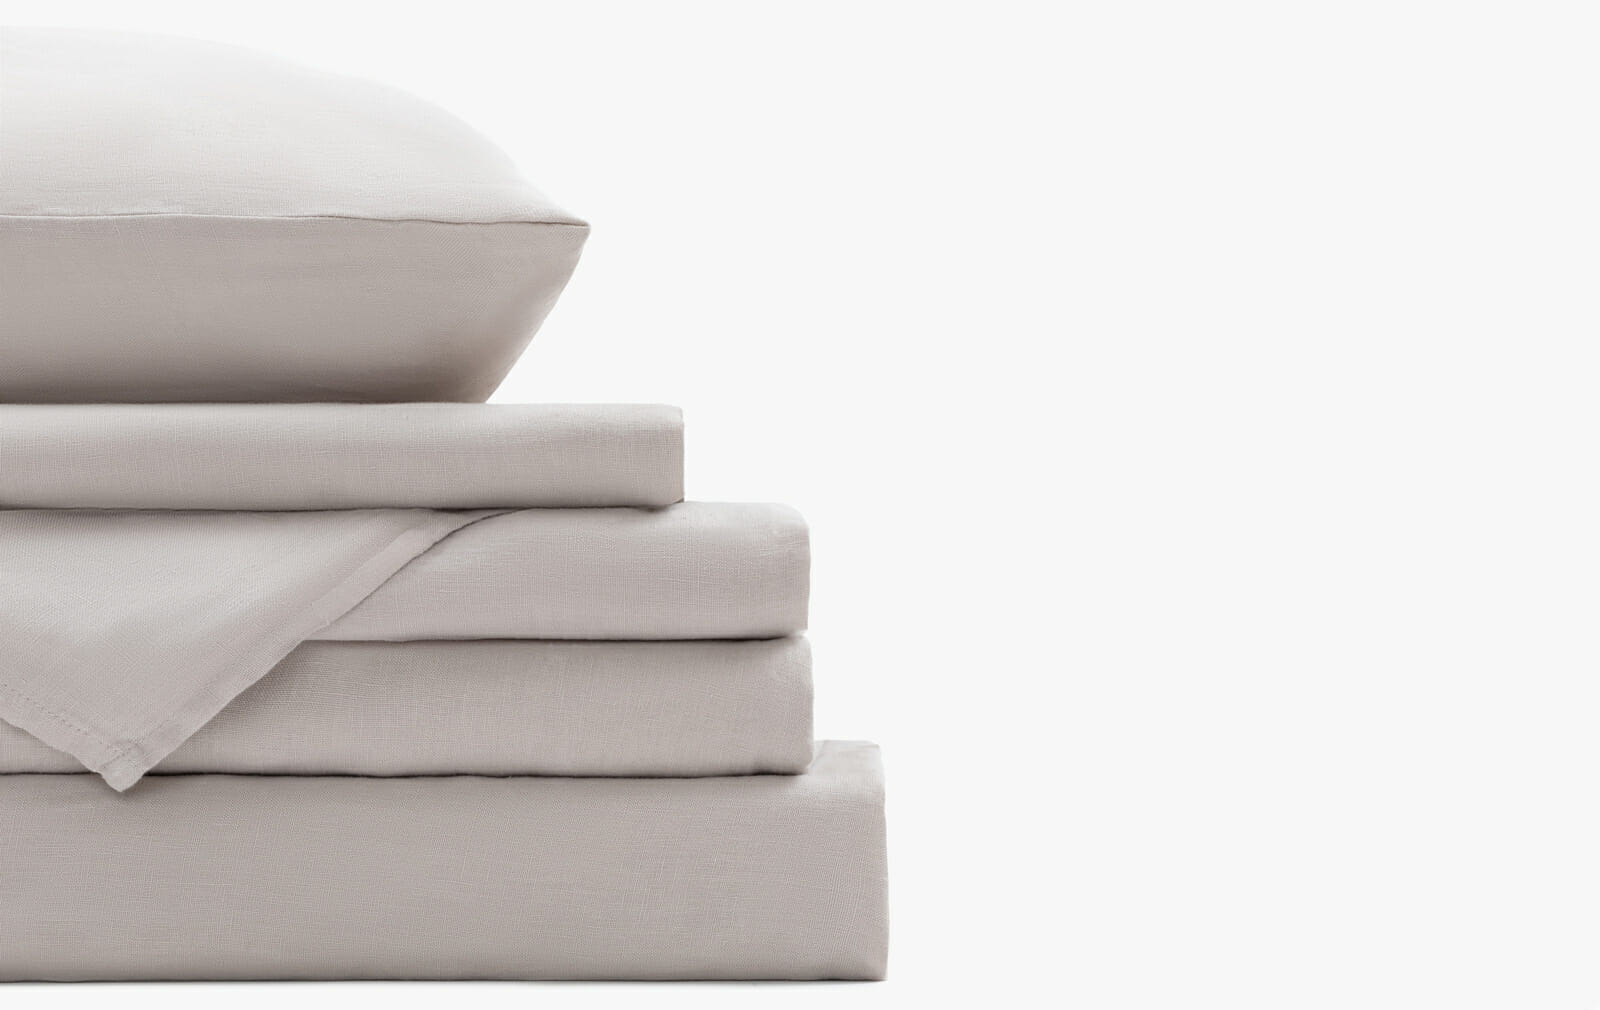 French linen bedding set - Sand